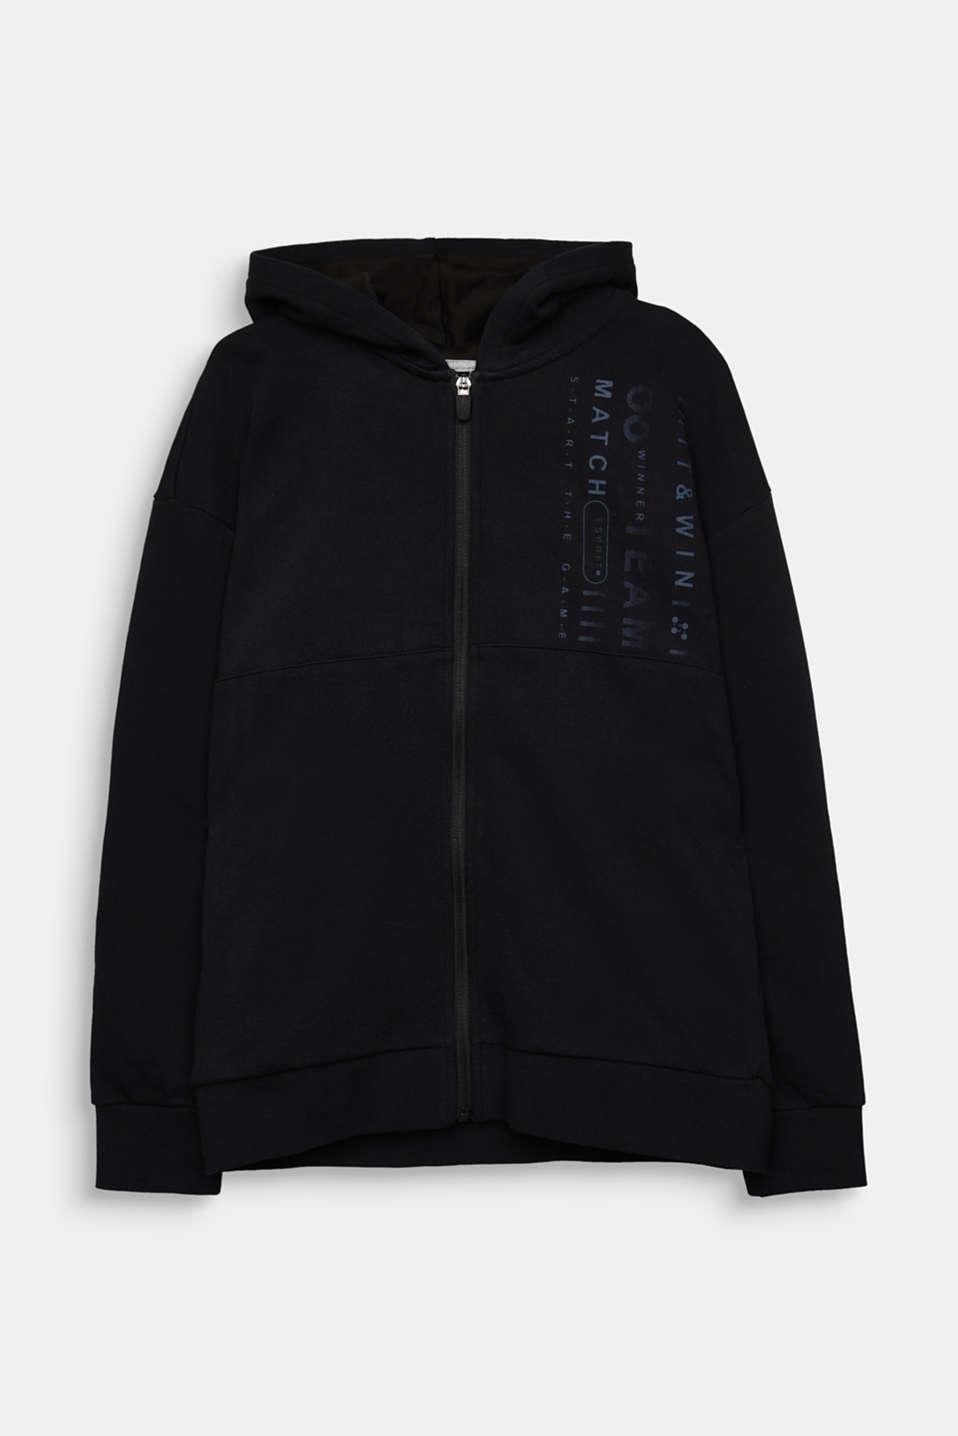 Sweatshirt cardigan with print, LCBLACK, detail image number 0